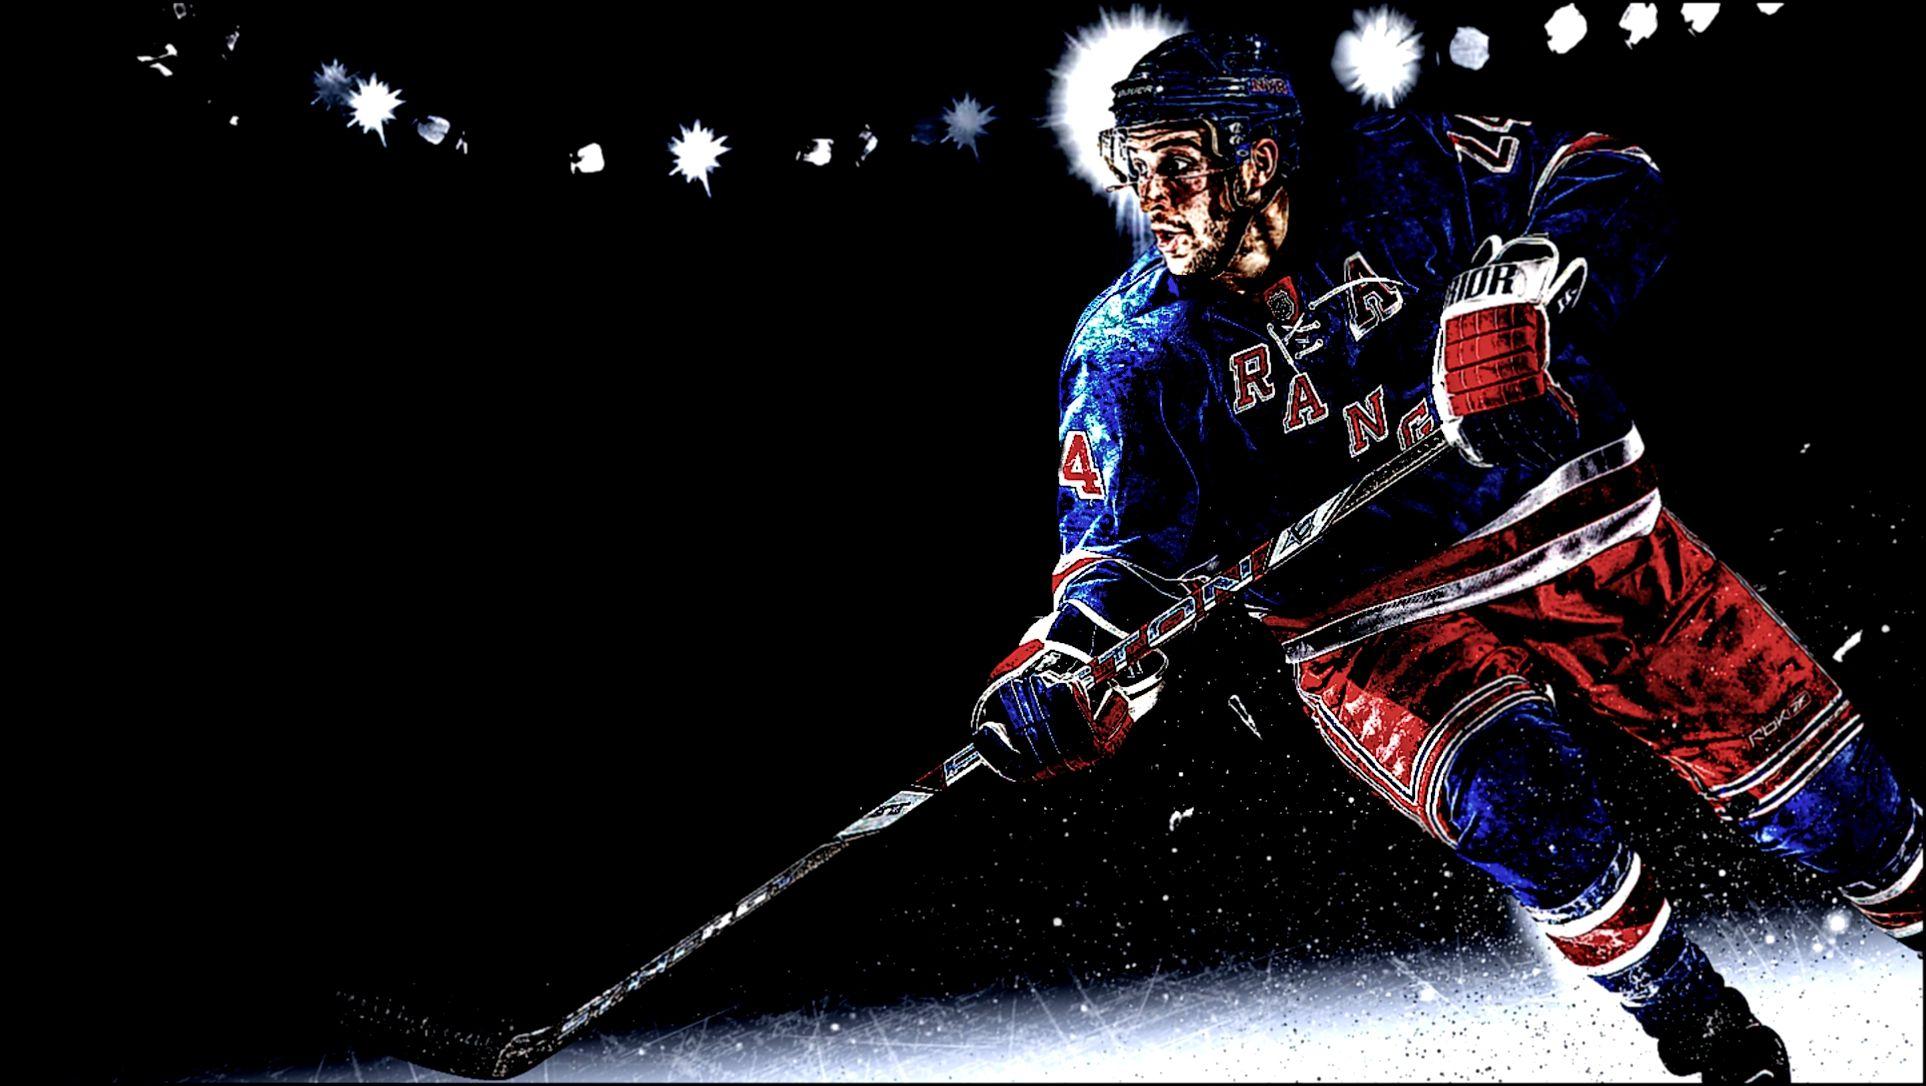 Hockey Wallpaper Best Hd Wallpaper Hockey Pictures New York Rangers Hockey